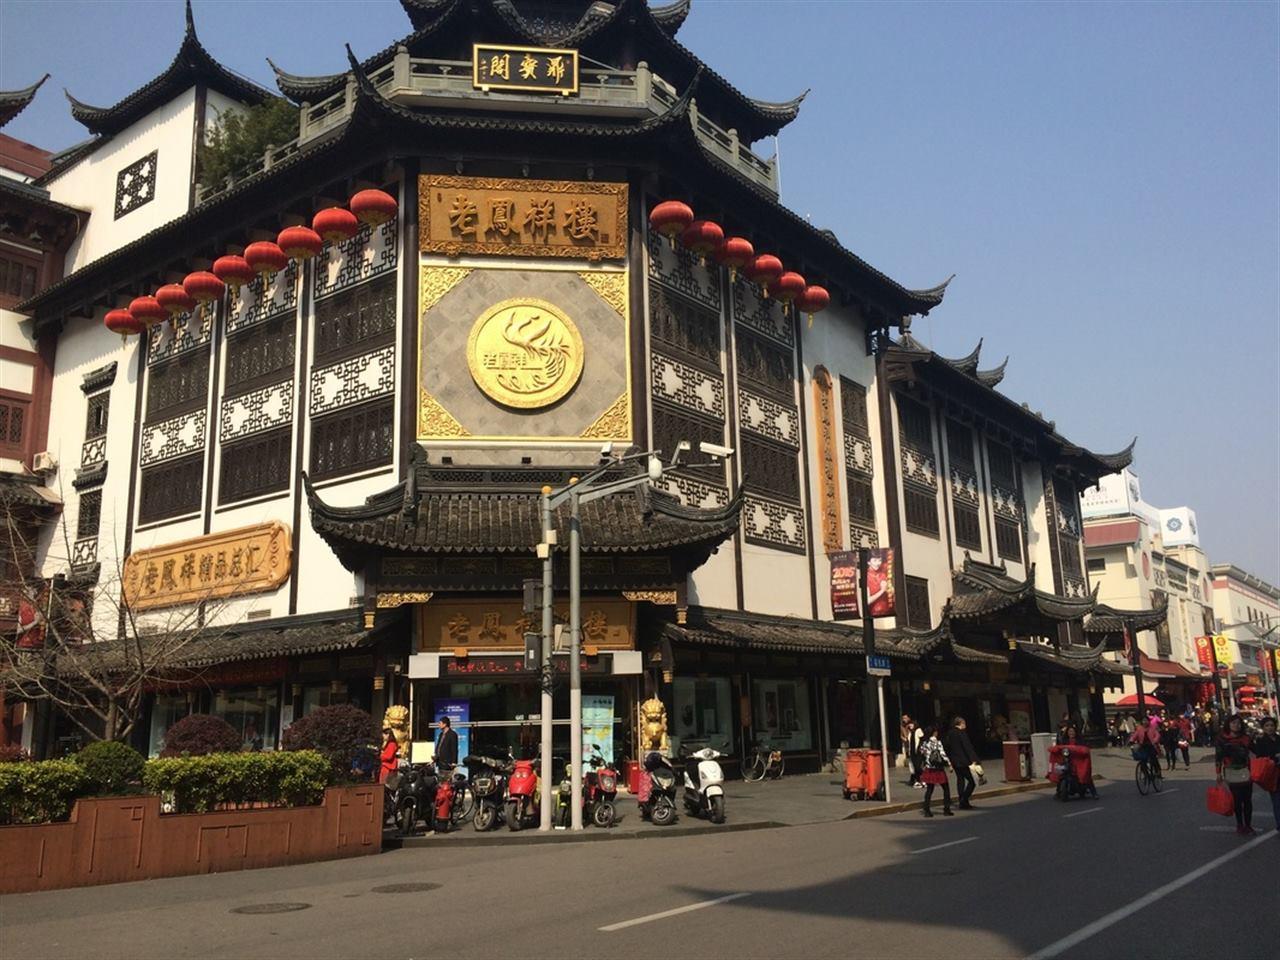 Центральный вход в парк Юй Юань Шанхай